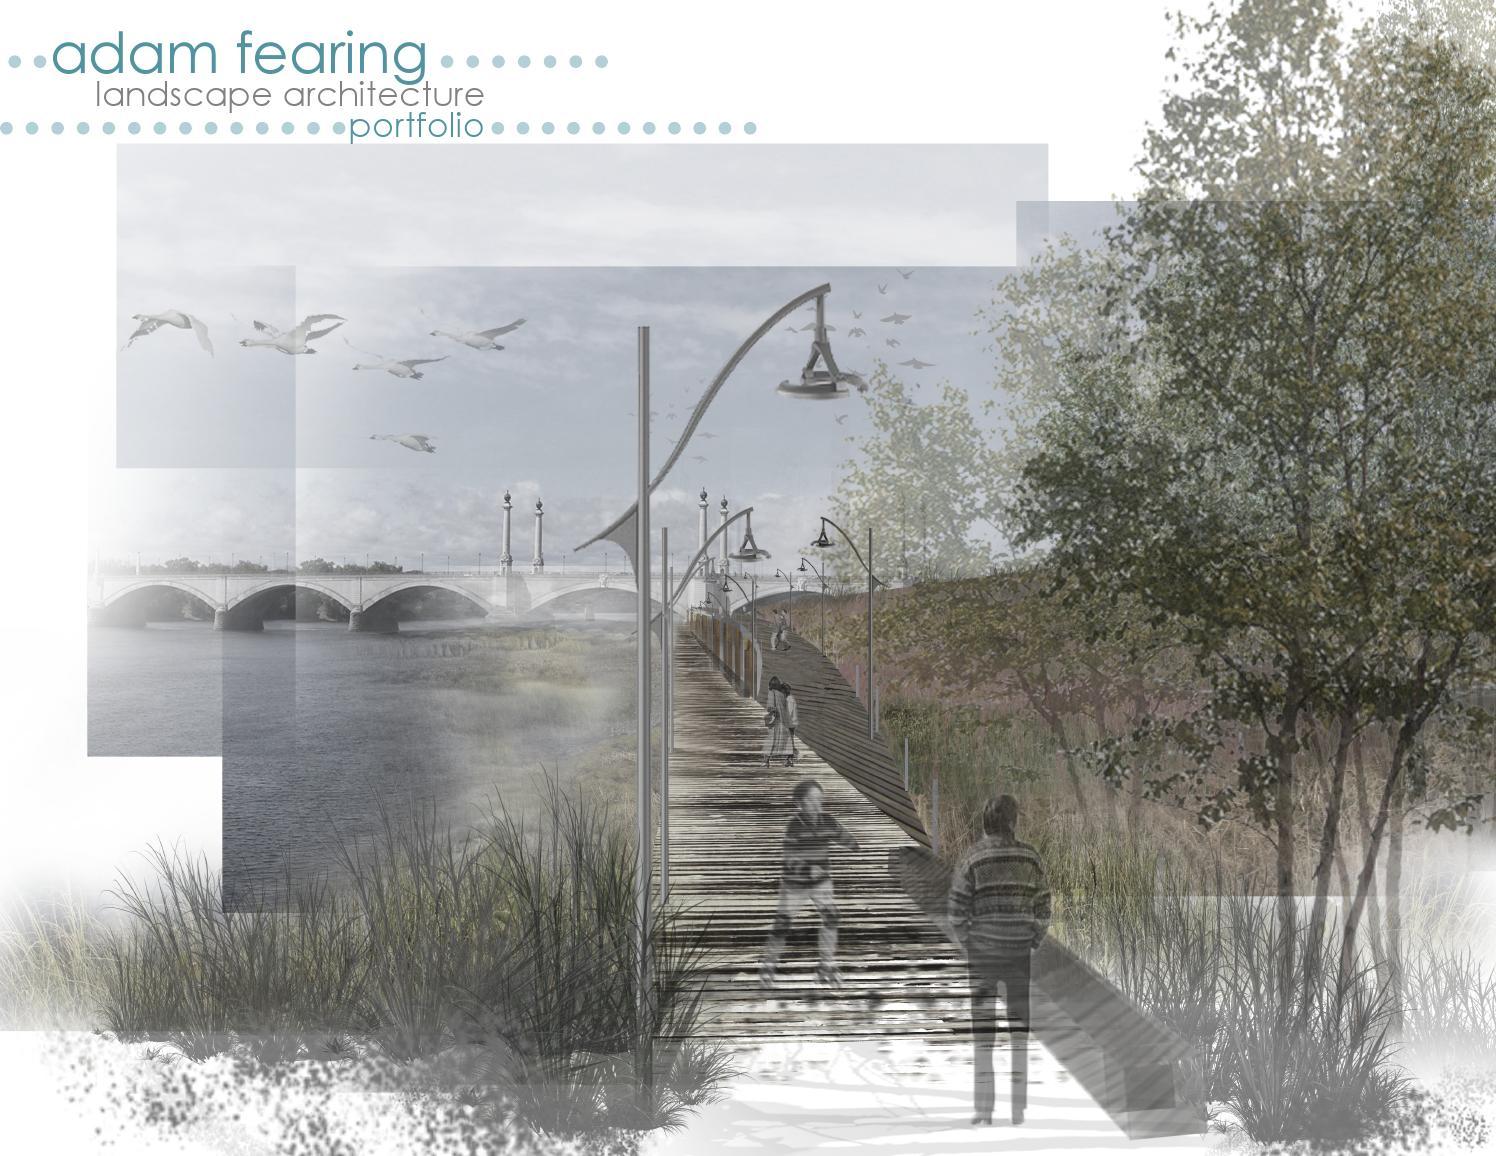 Landscape Architecture Portfolio By Adam Fearing Issuu